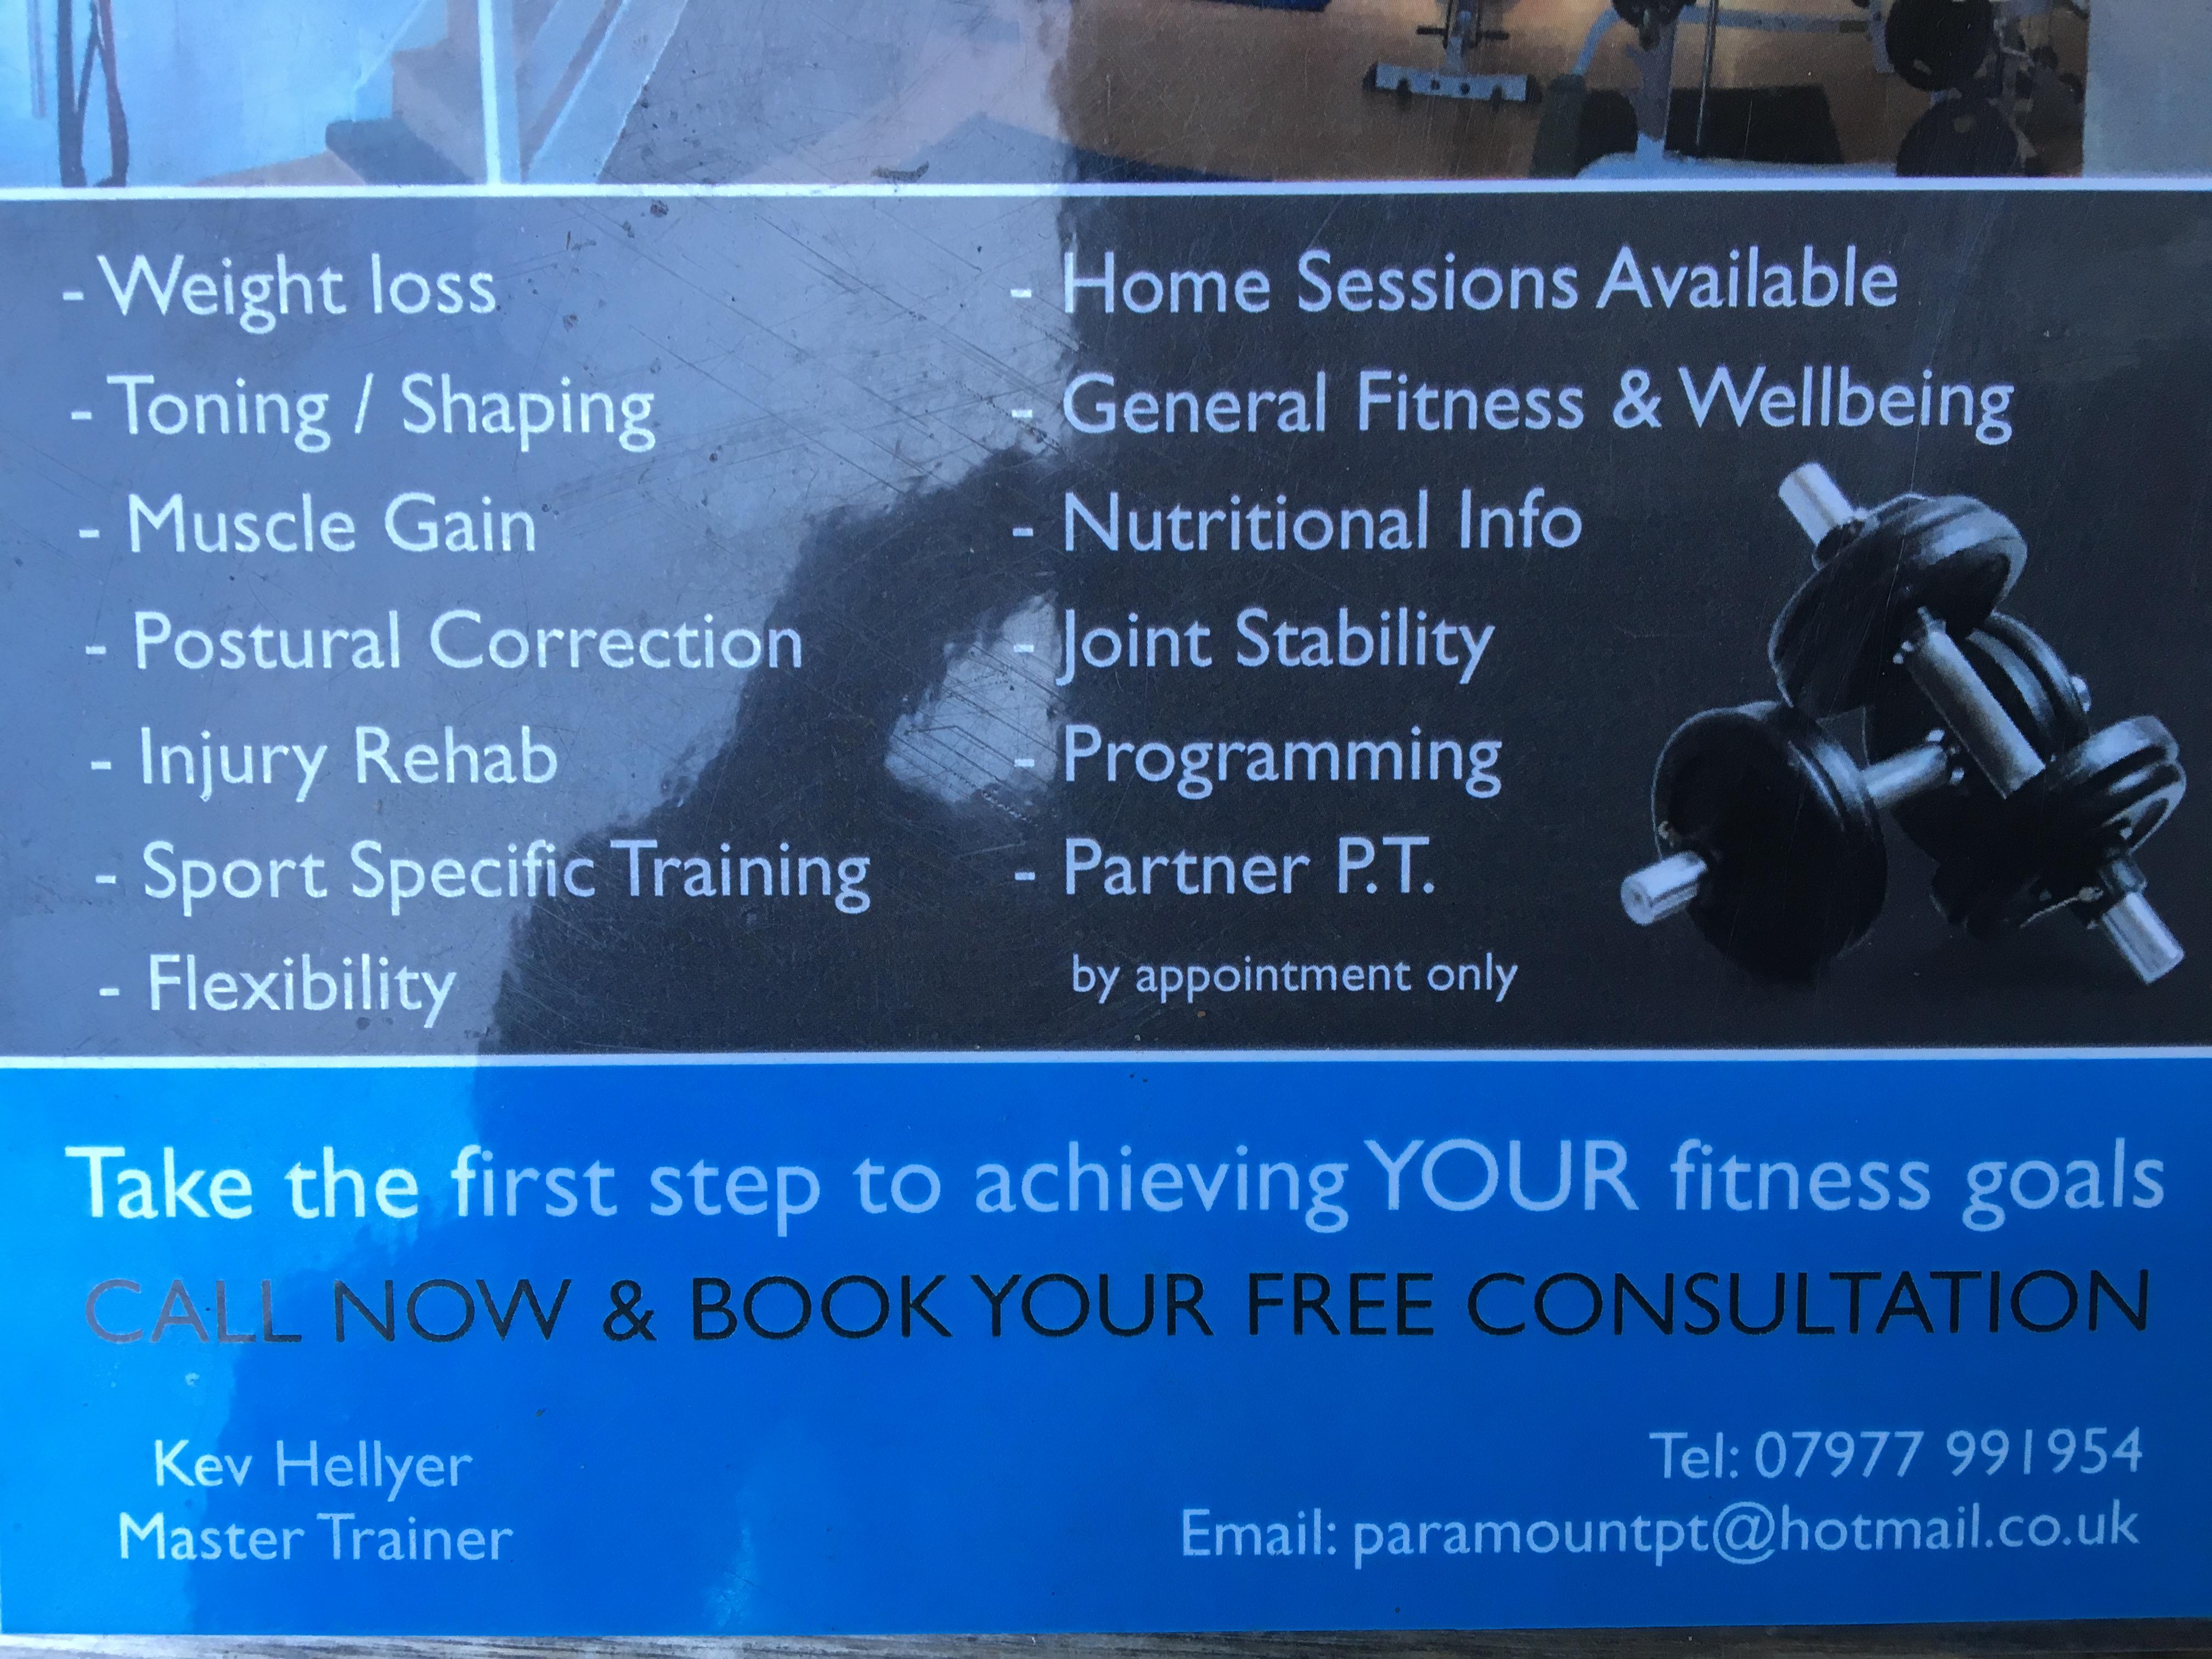 Paramount personal training